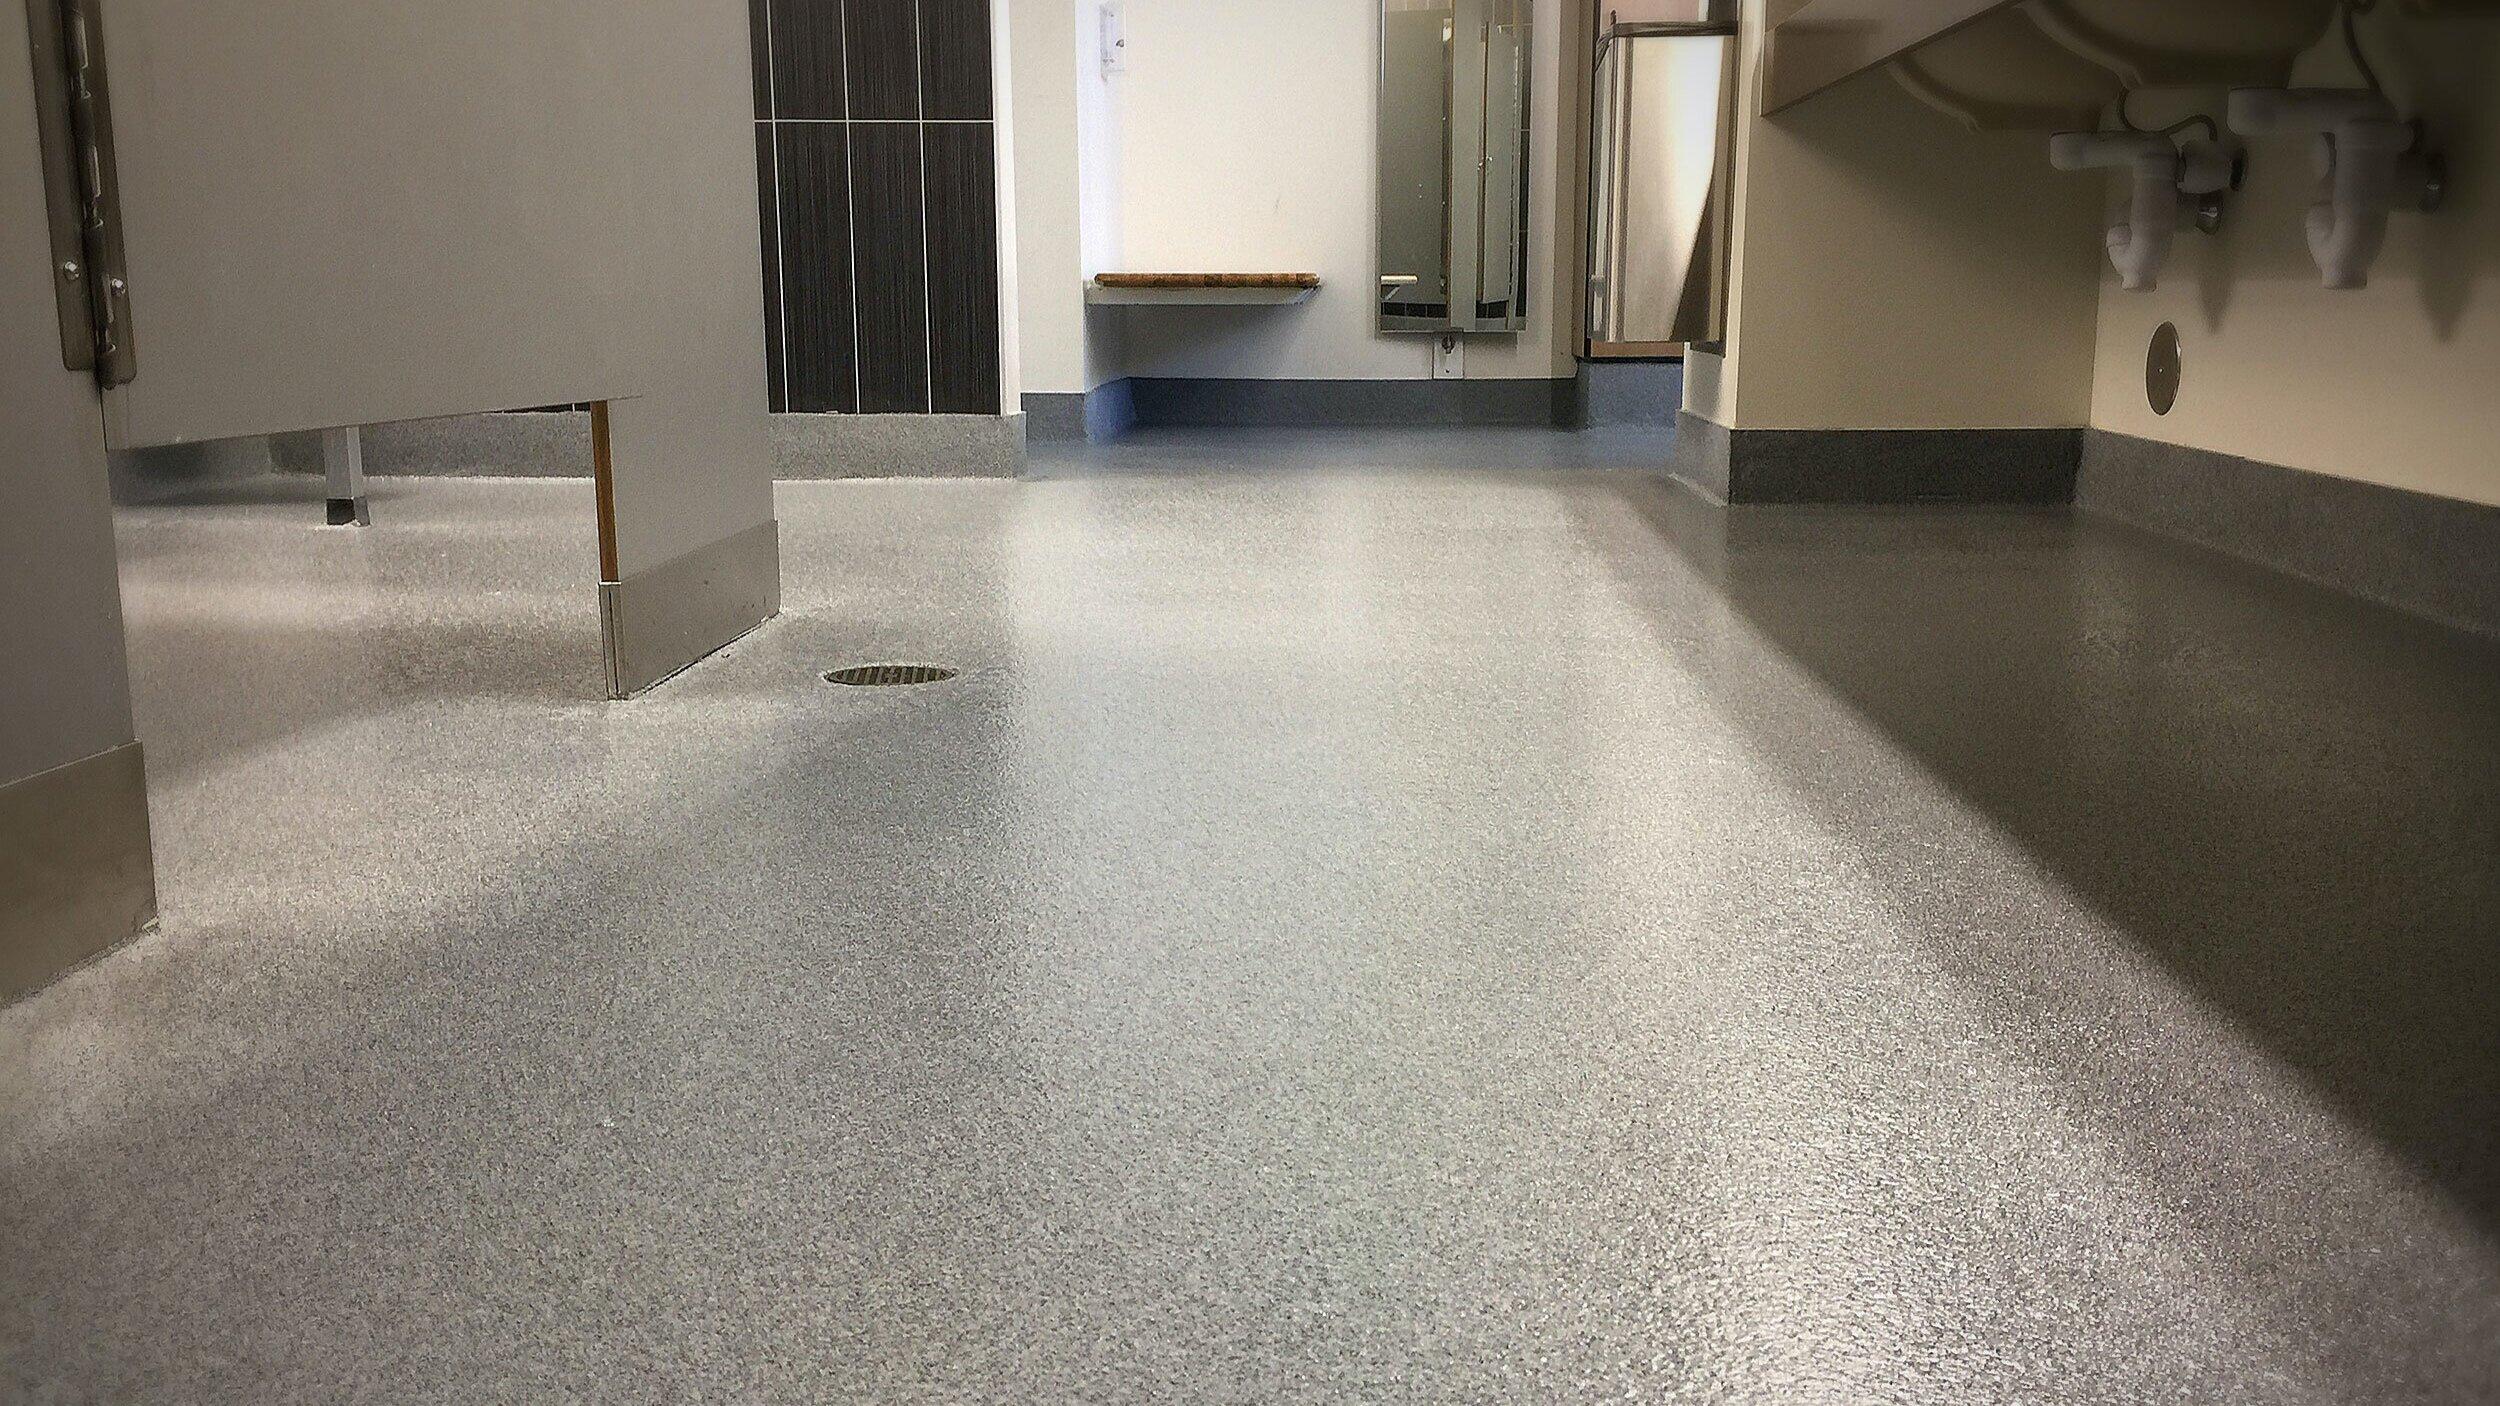 Cv Crete Resin Epoxy Flooring